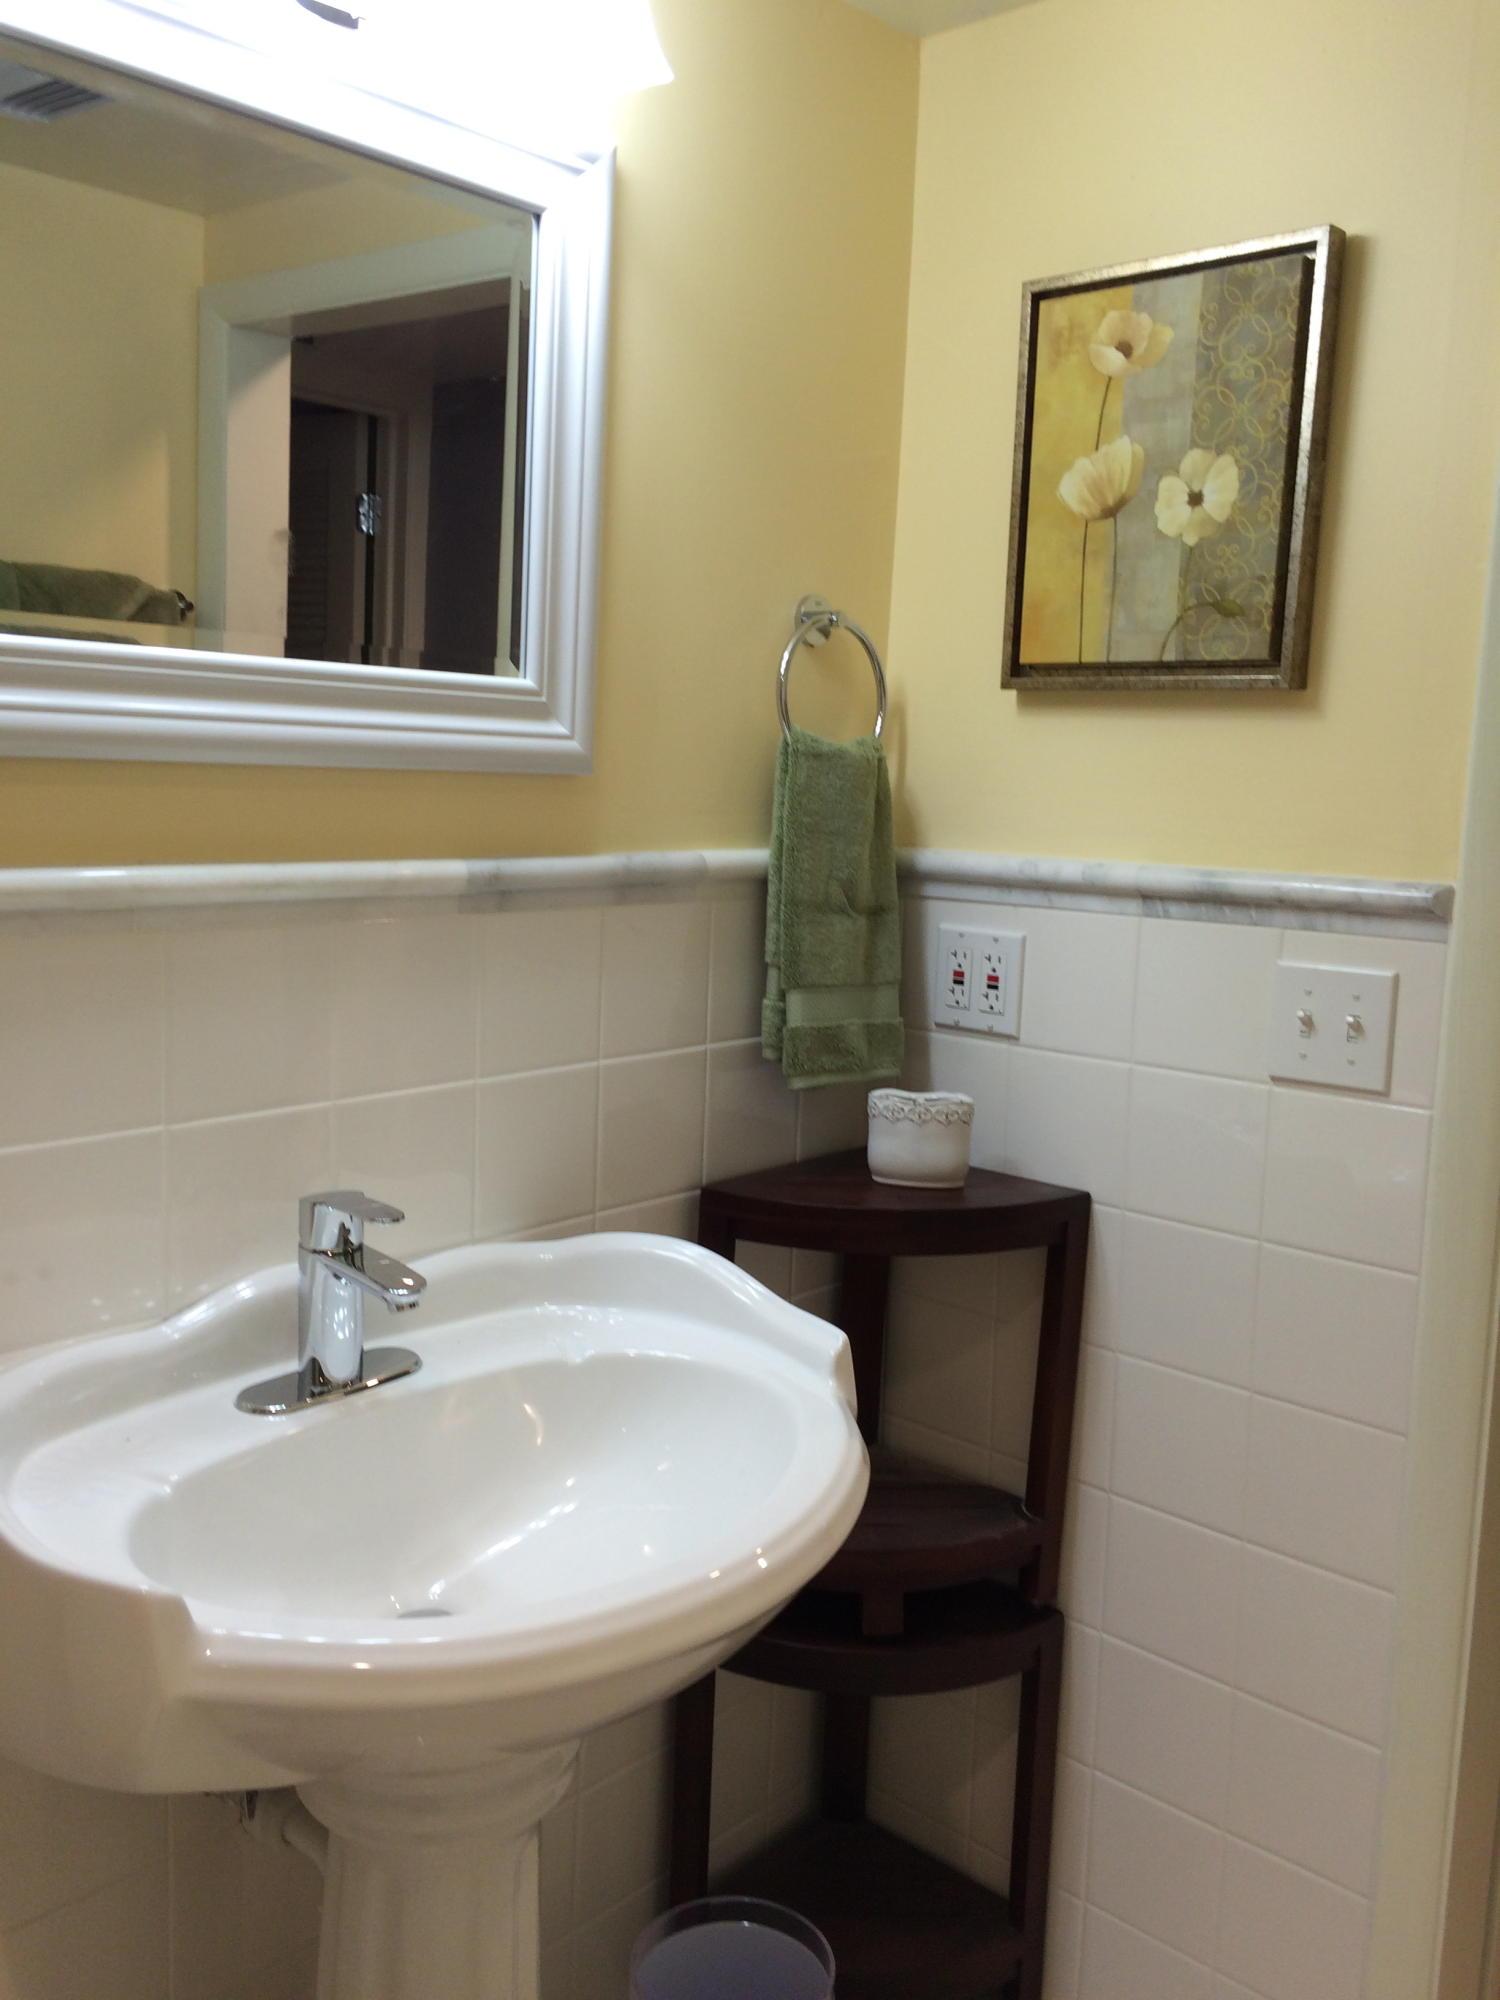 Guest Bathroom - sink closeup